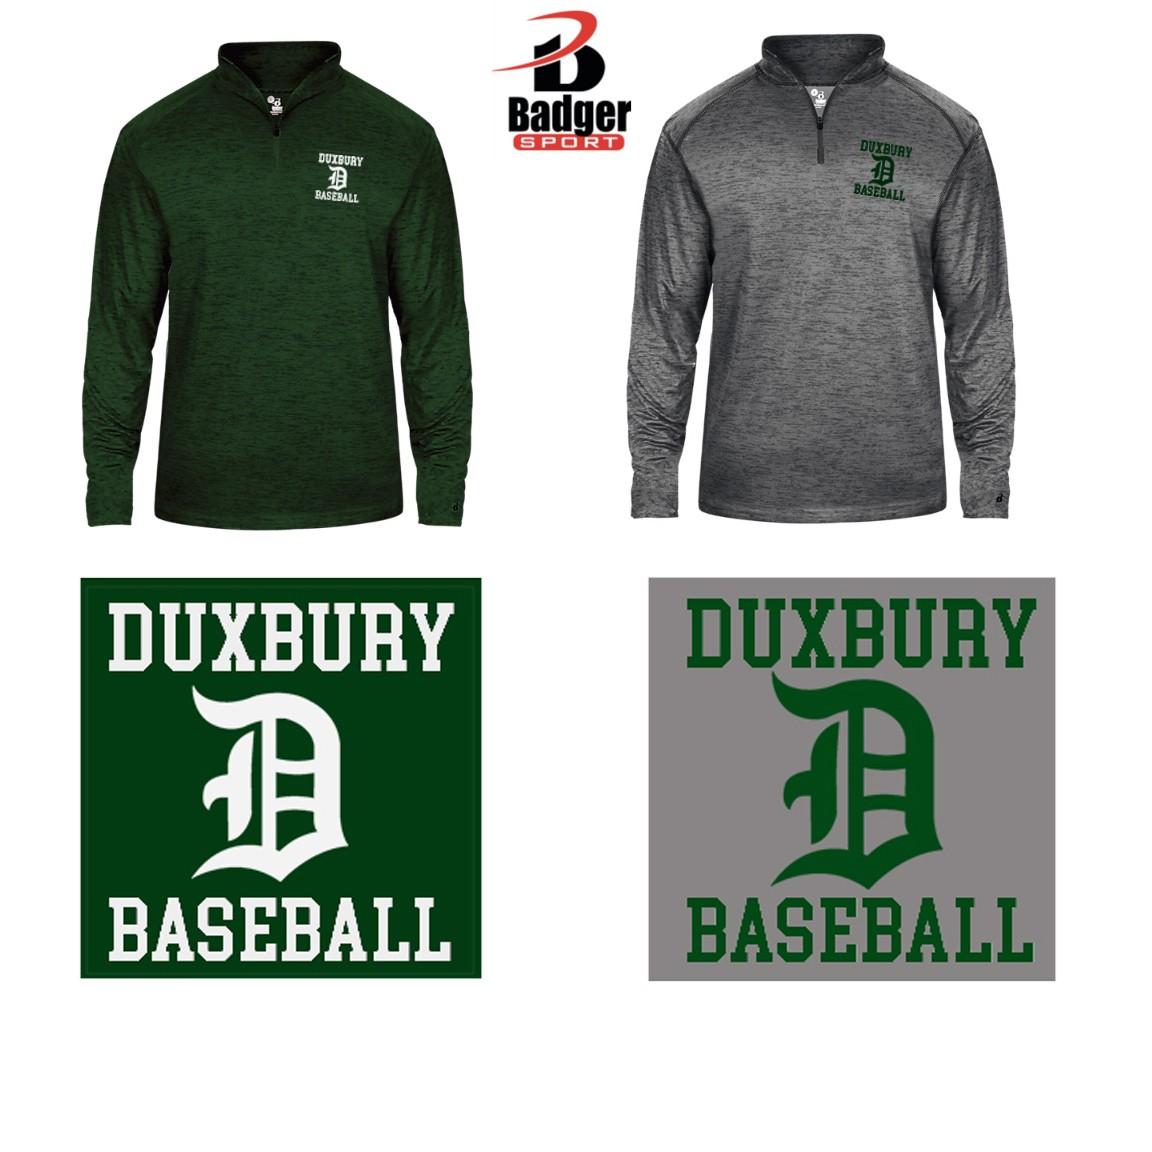 Duxbury Youth Baseball Badger Tonal Blend 1/4-Zip, Mens, EMBROIDERED